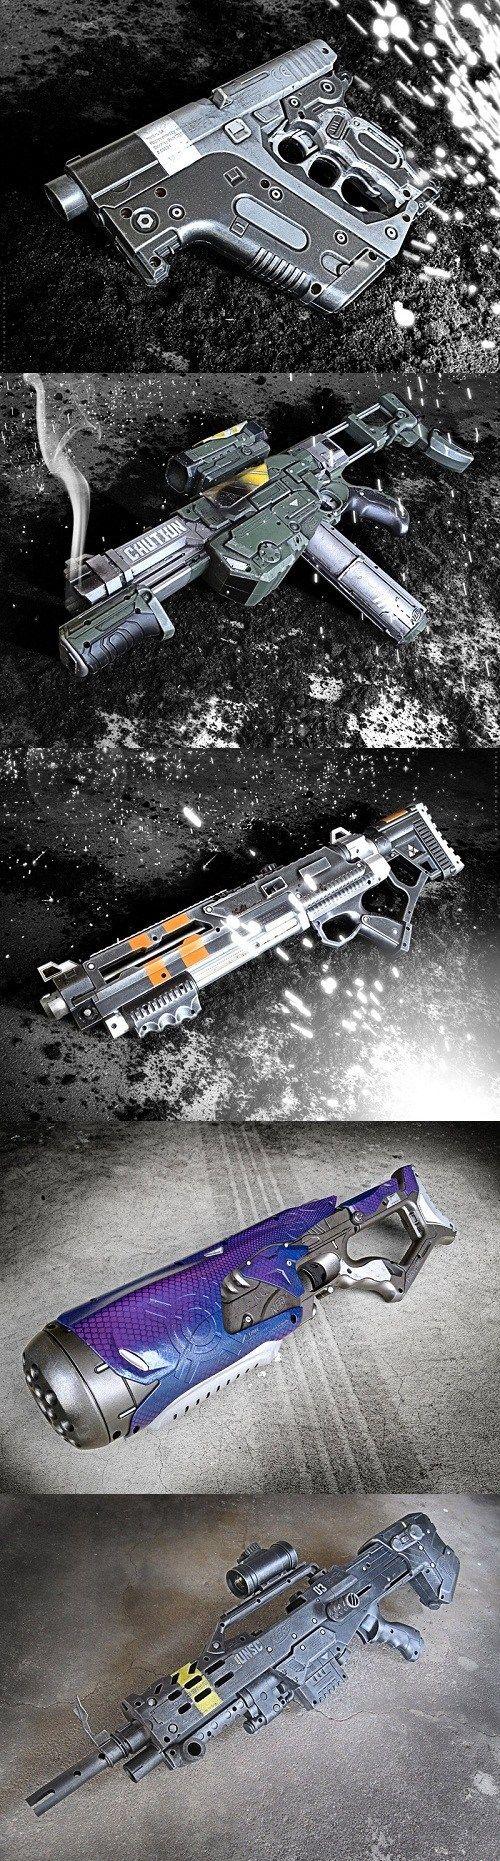 Halo Inspired Nerf Guns. Do I want these? Is like Schwarzenegger hard to spell?